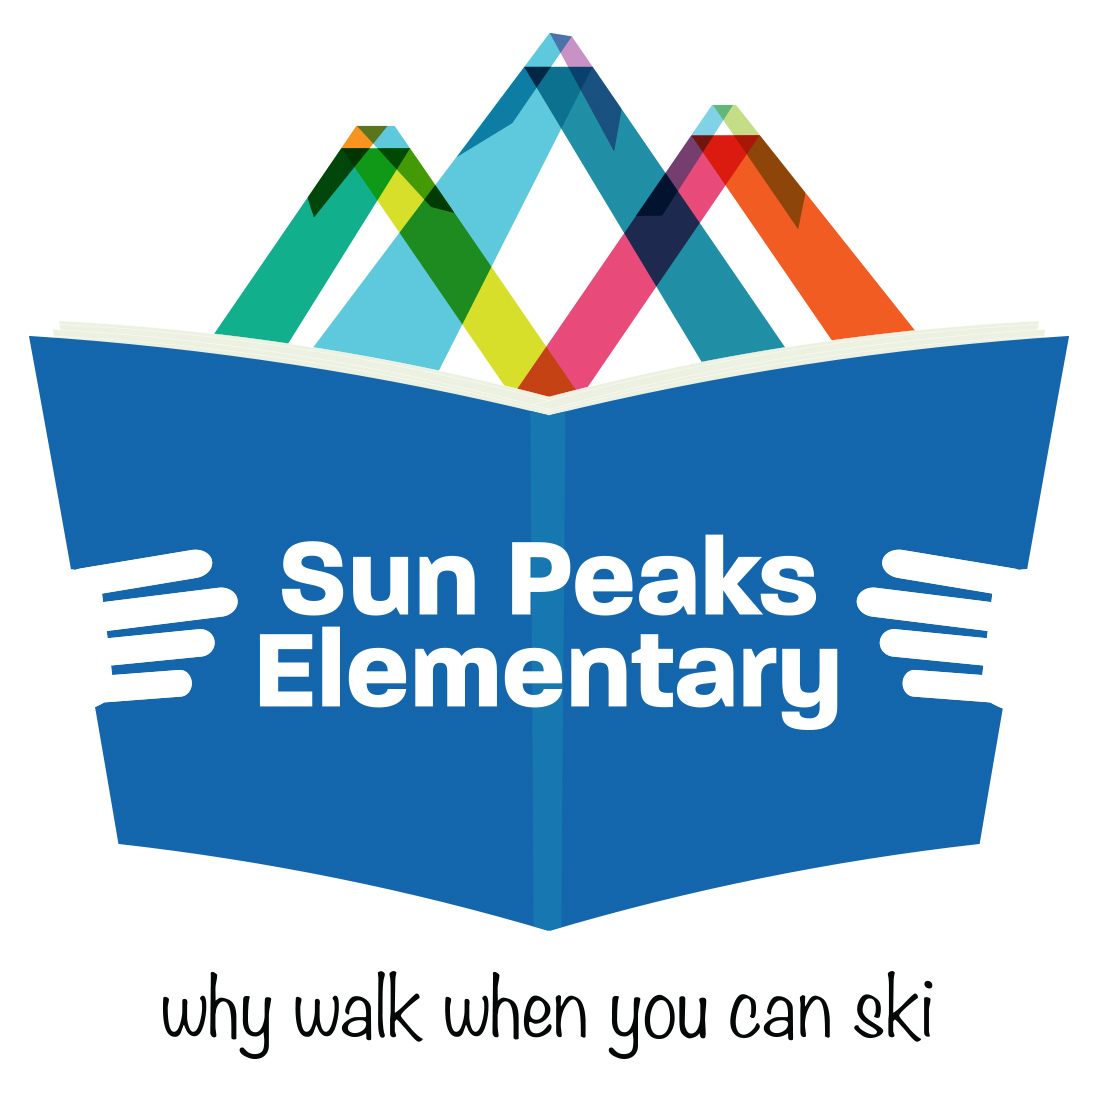 Sun Peaks Elementary